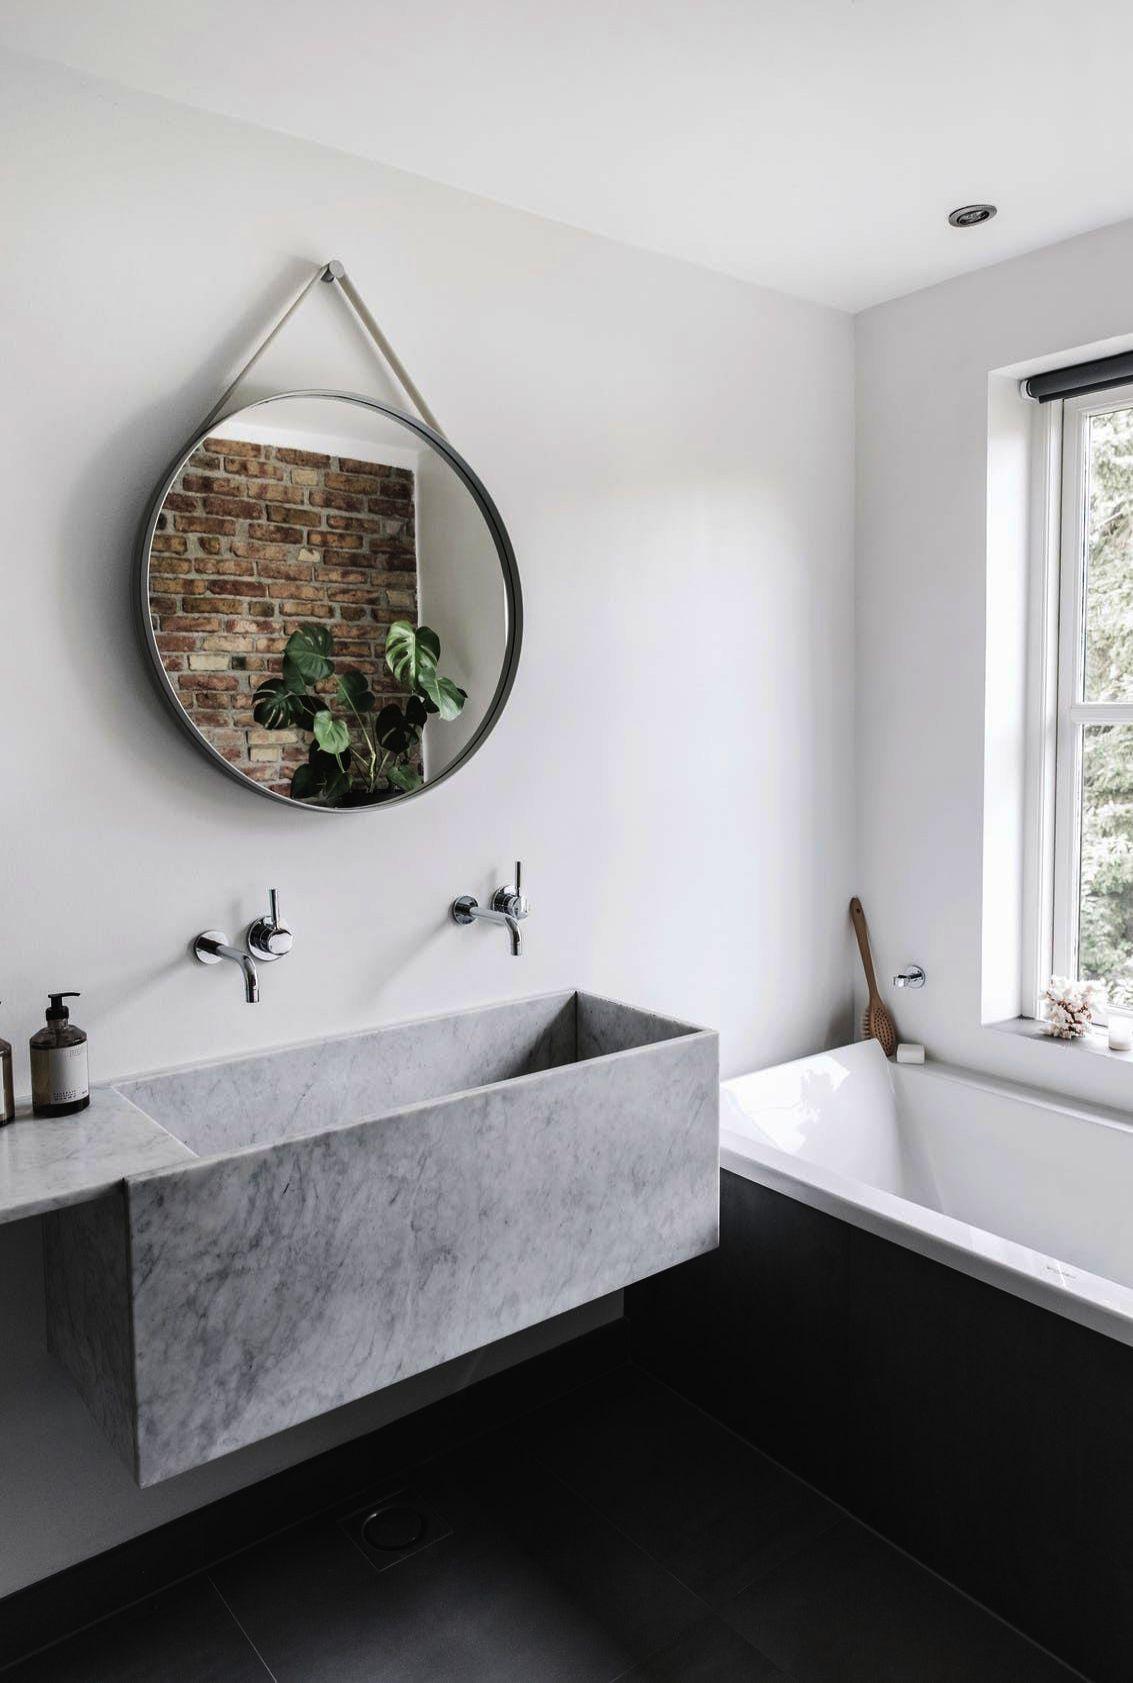 Bathroom Vanities On Long Island - Bathroom Design